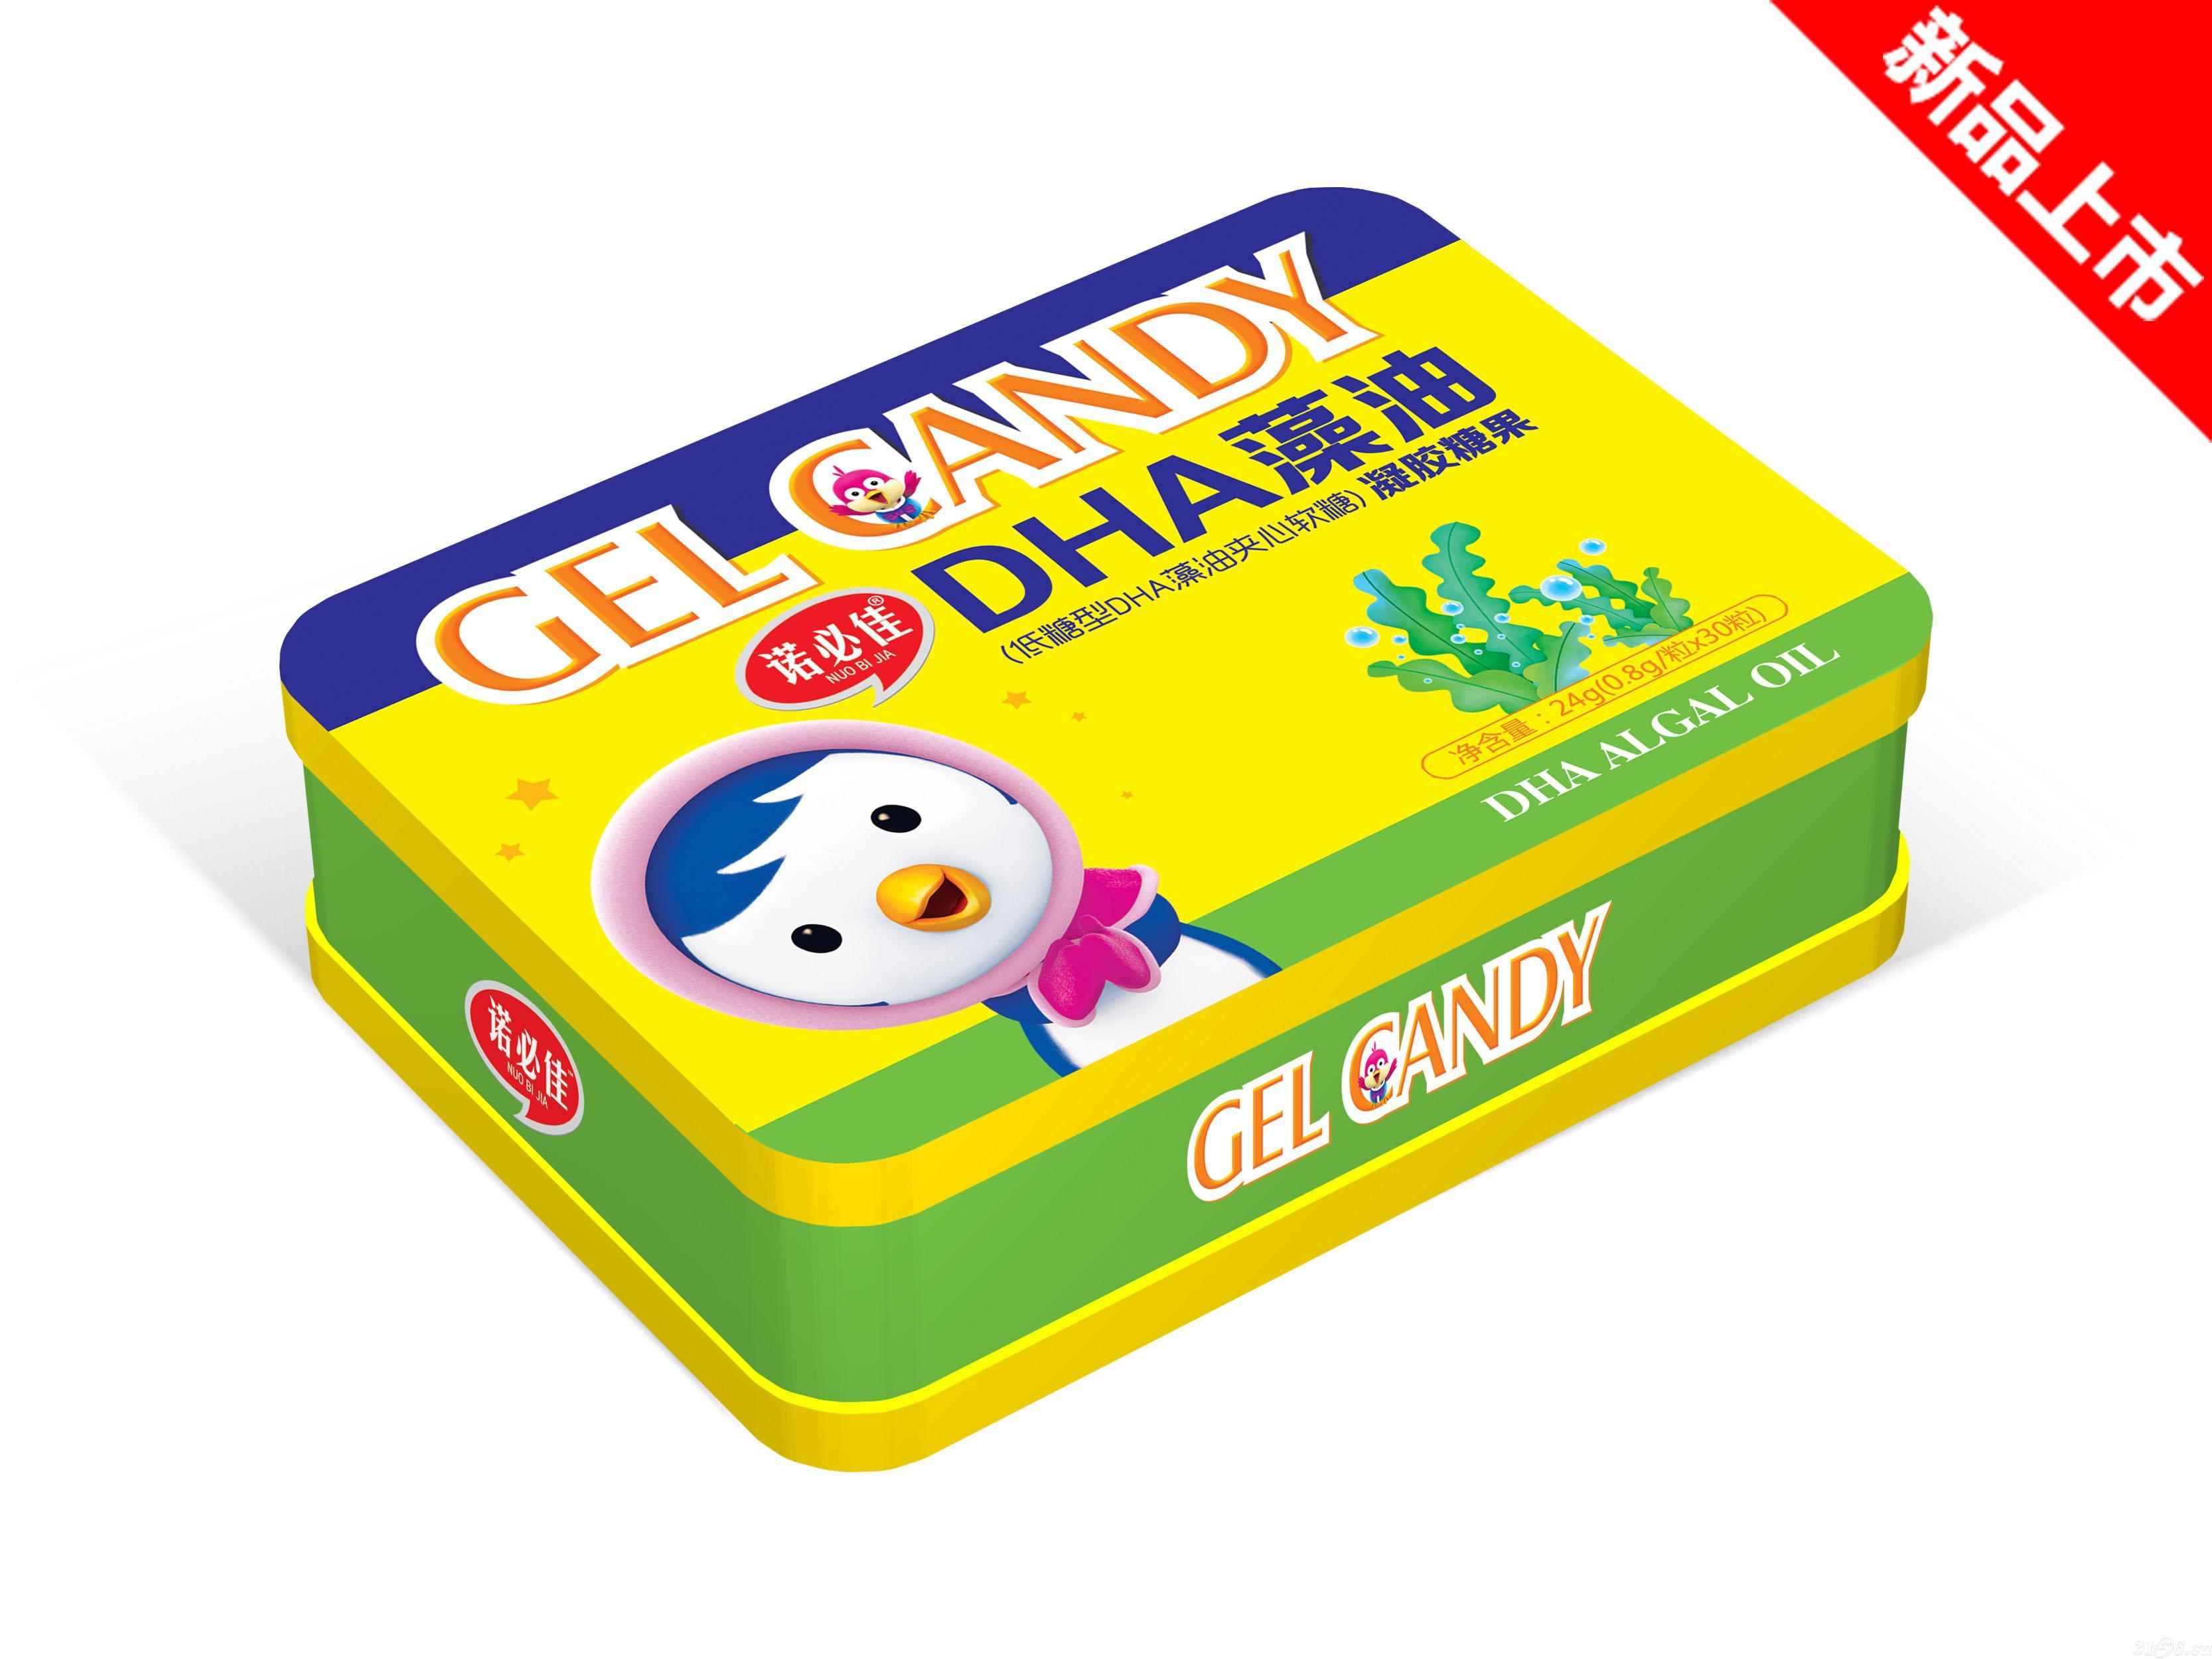 DHA藻油凝胶糖果铁盒